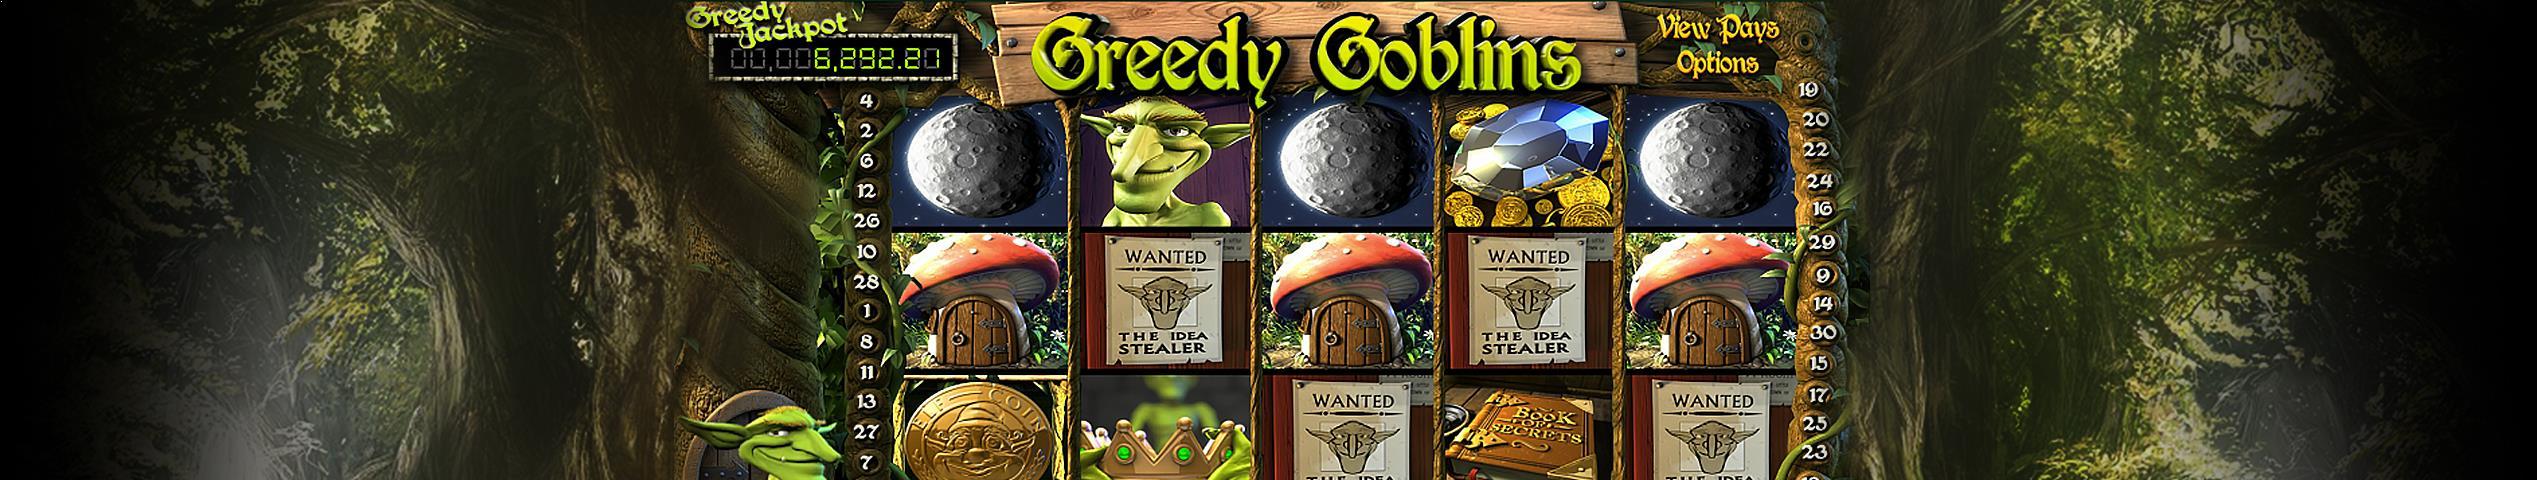 Greedy Goblins betsoft jocuri slot slider